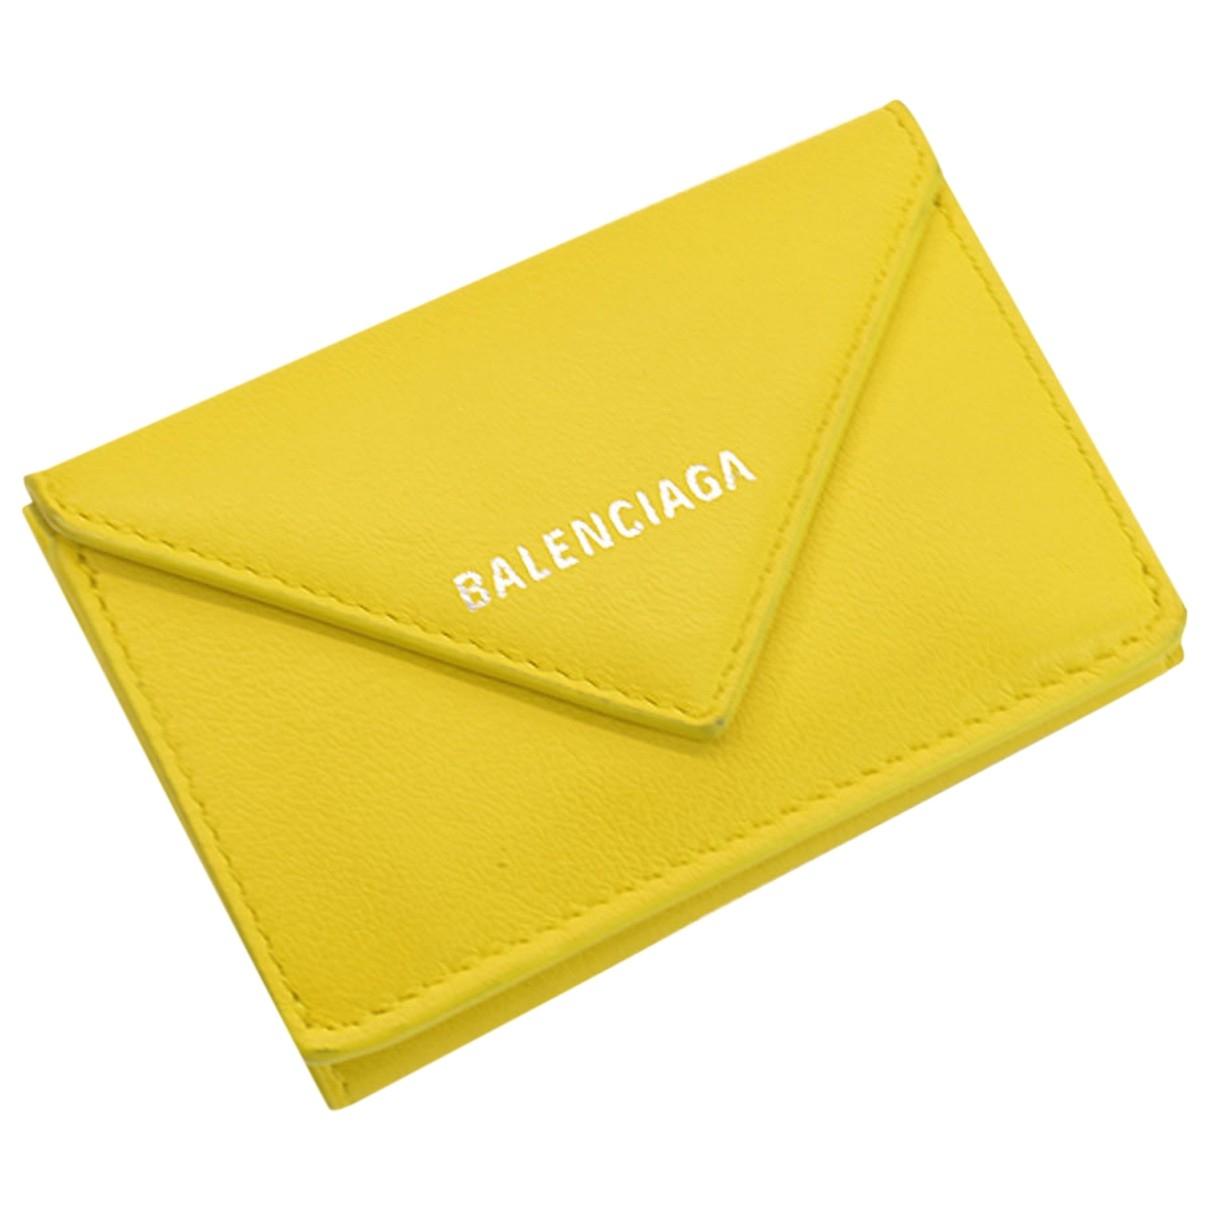 Balenciaga \N Yellow Leather wallet for Women \N